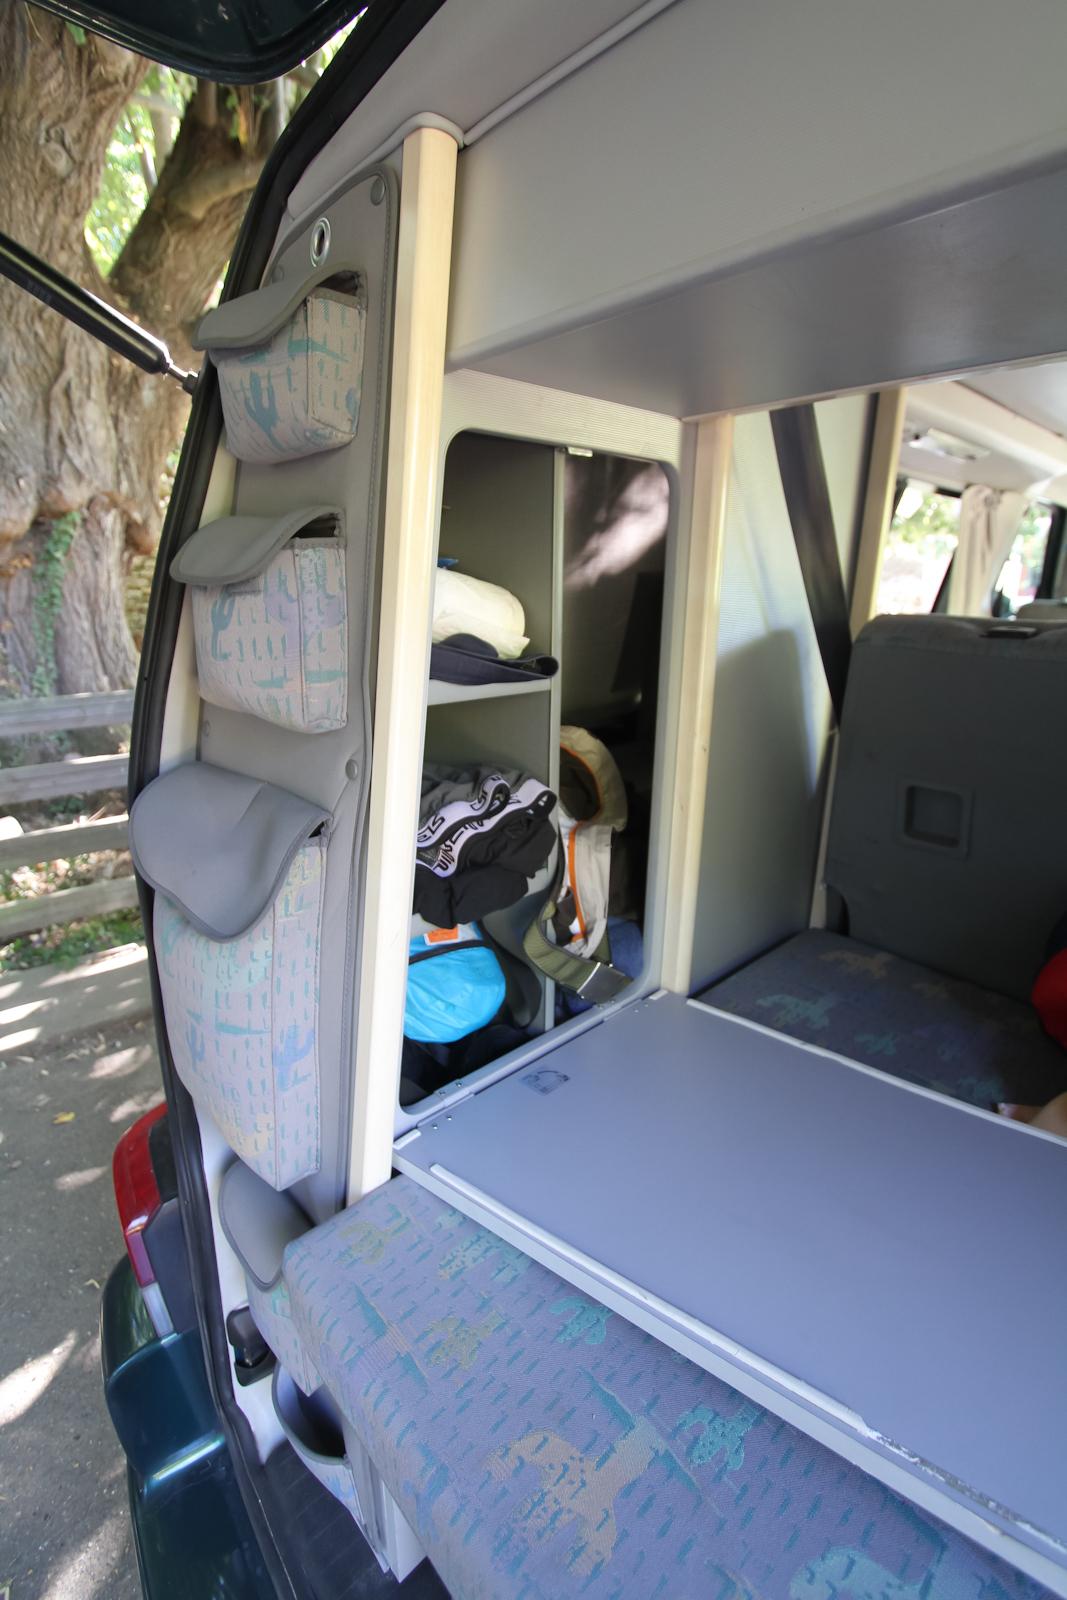 mon kombi vw california syncro 4x4 l 39 int rieur. Black Bedroom Furniture Sets. Home Design Ideas